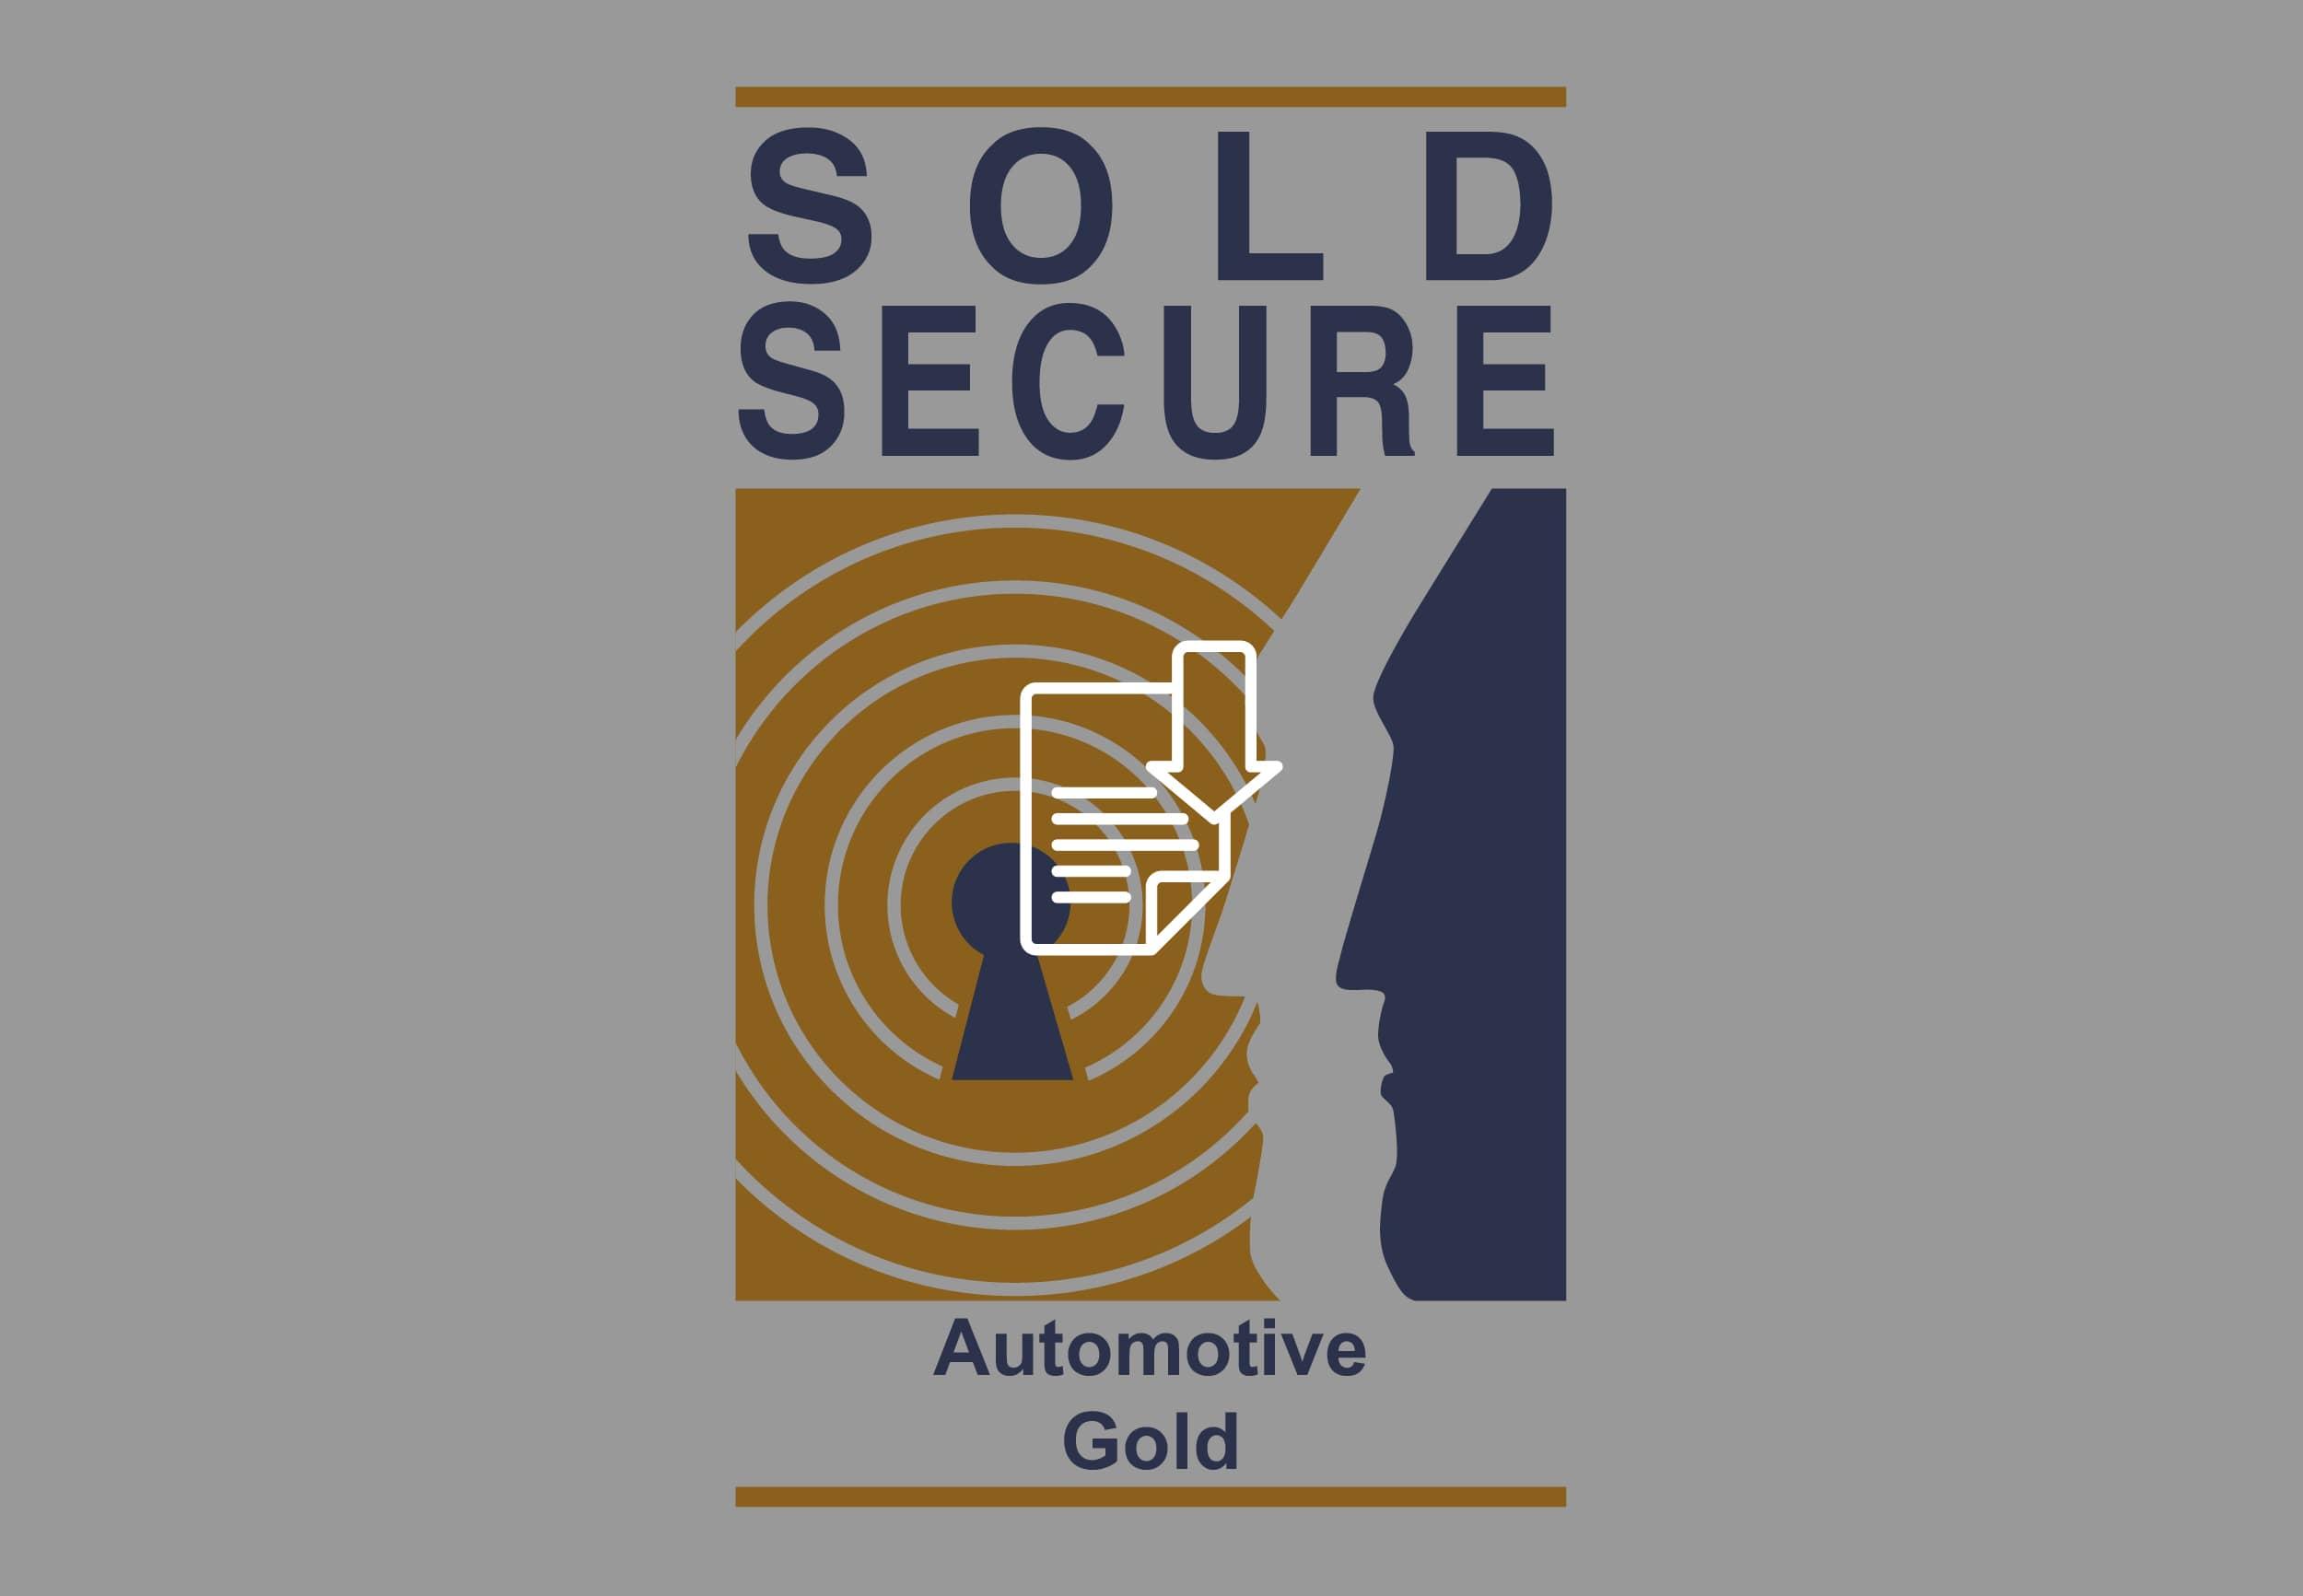 certificazione sold secure automotive gold